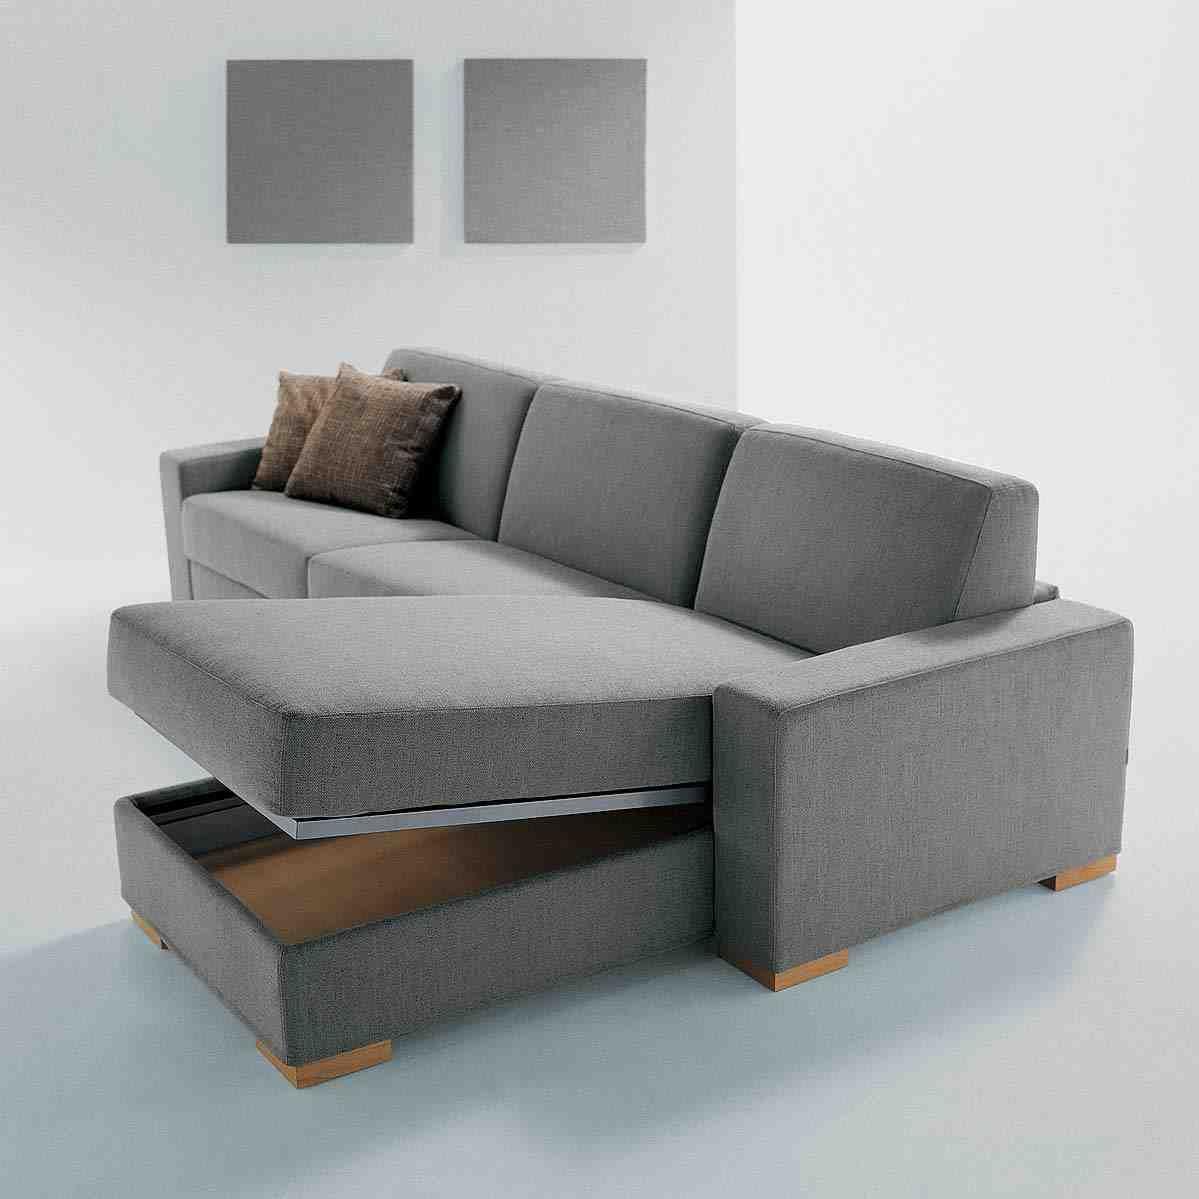 atherton home manhattan convertible futon sofa bed and lounger atherton home manhattan convertible futon sofa bed and lounger      rh   pinterest